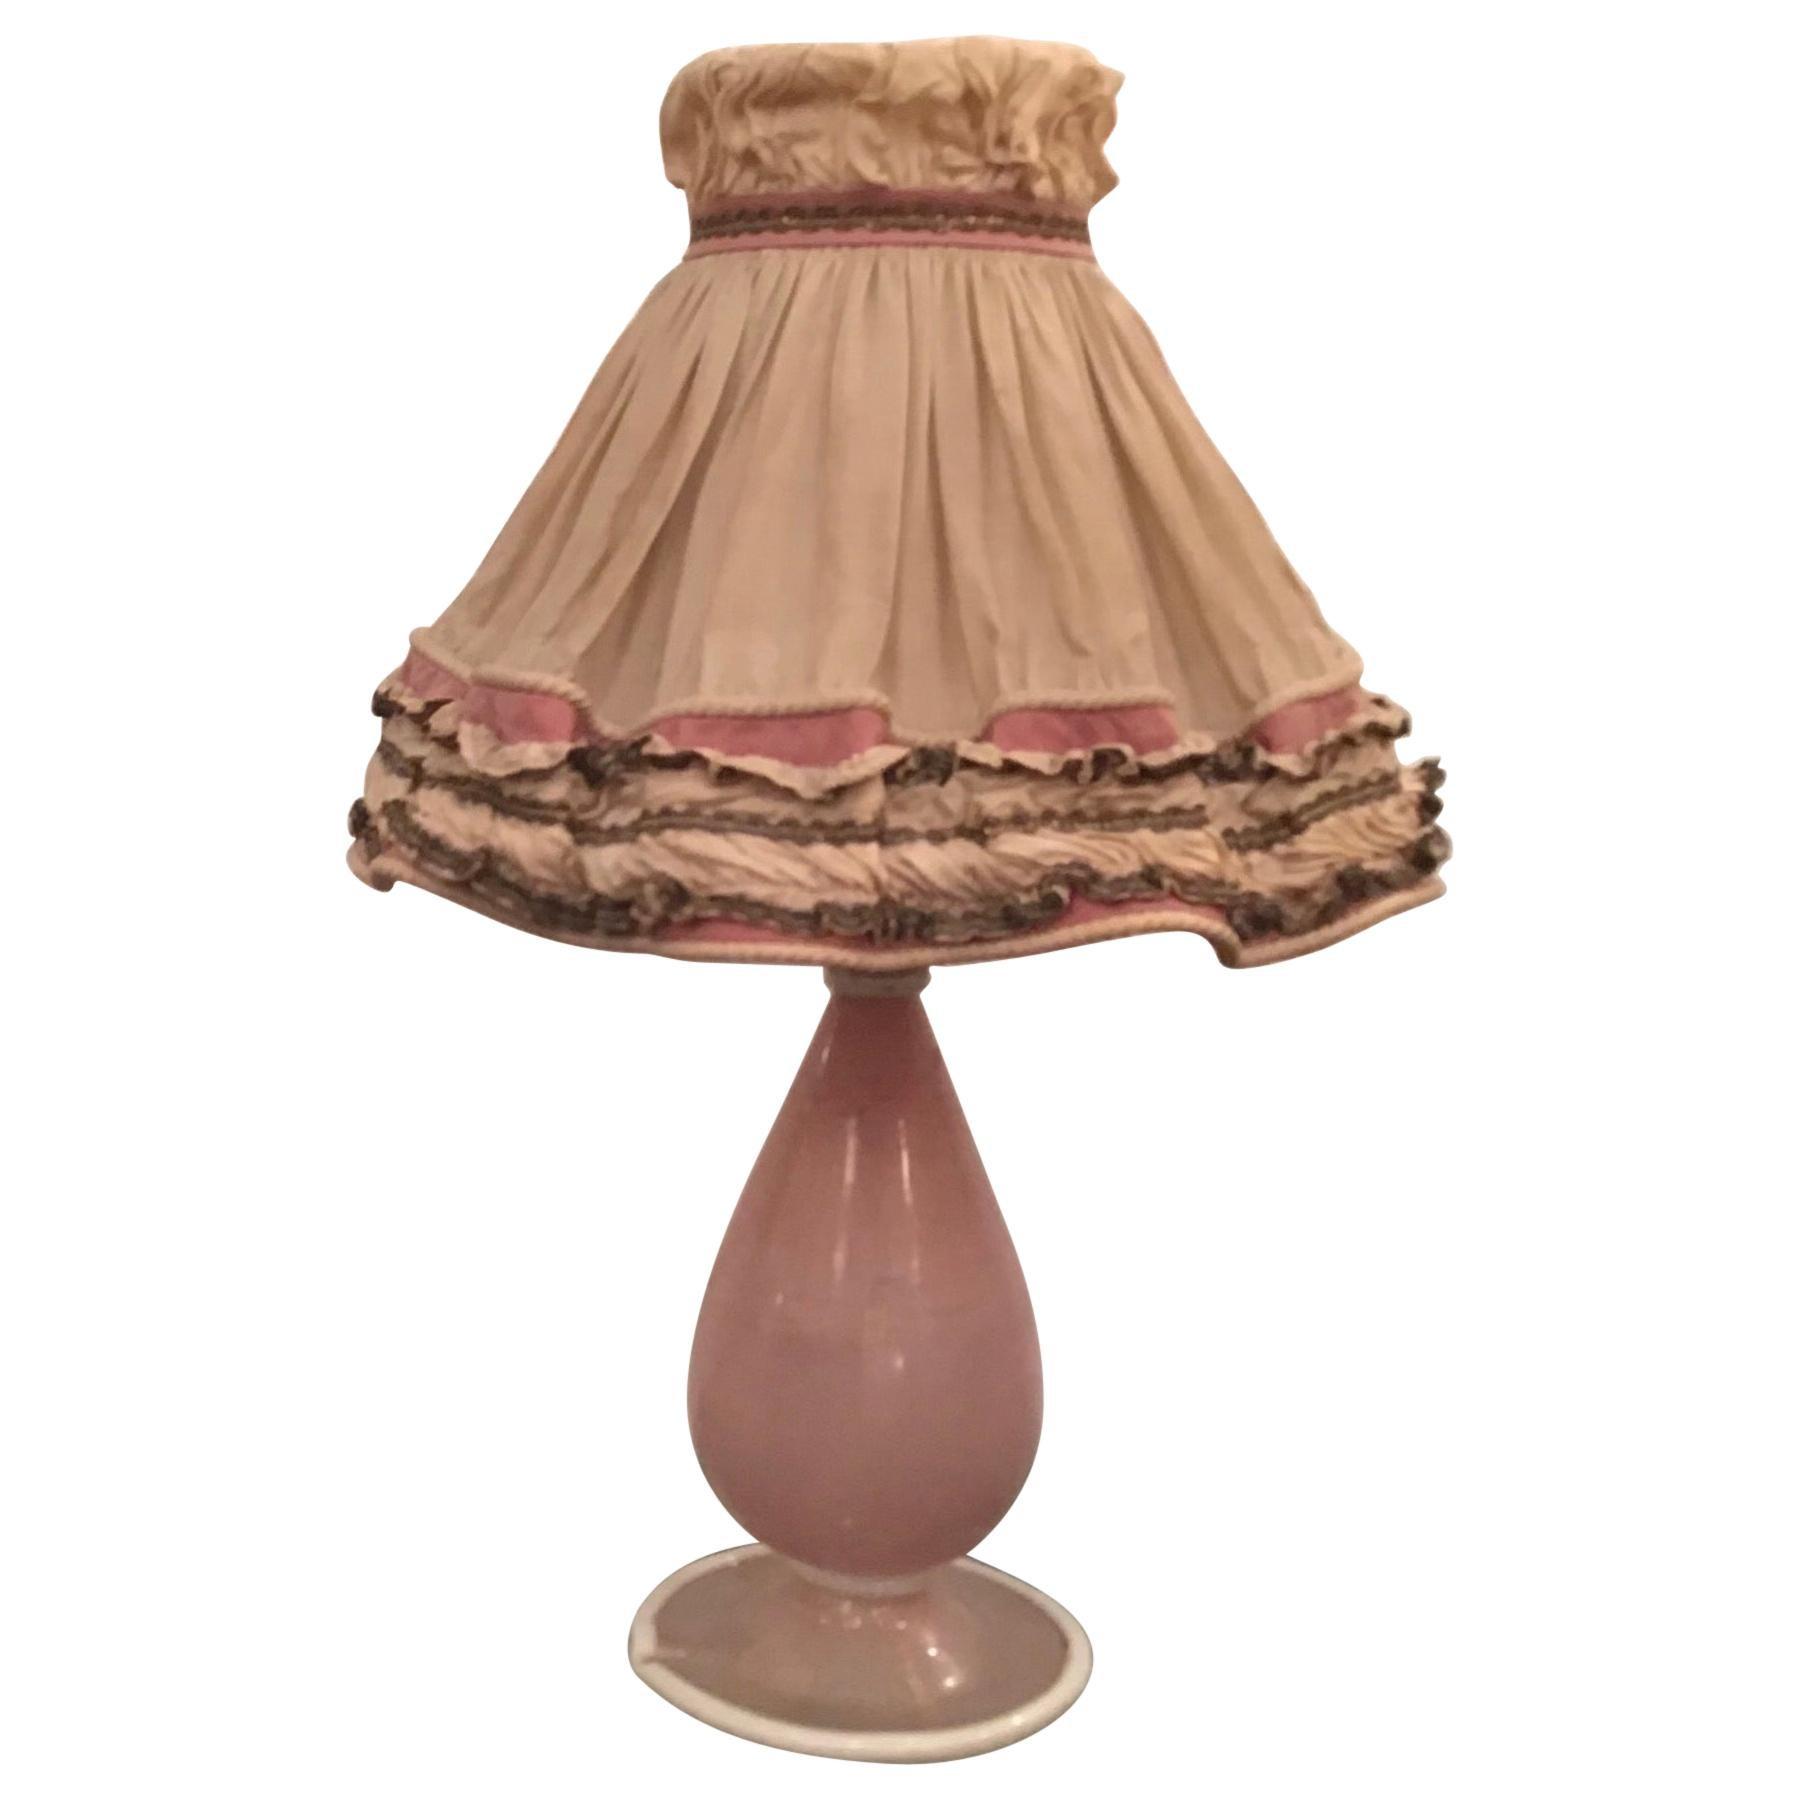 Venini Murano Glass Table Lamp 1950 Italy